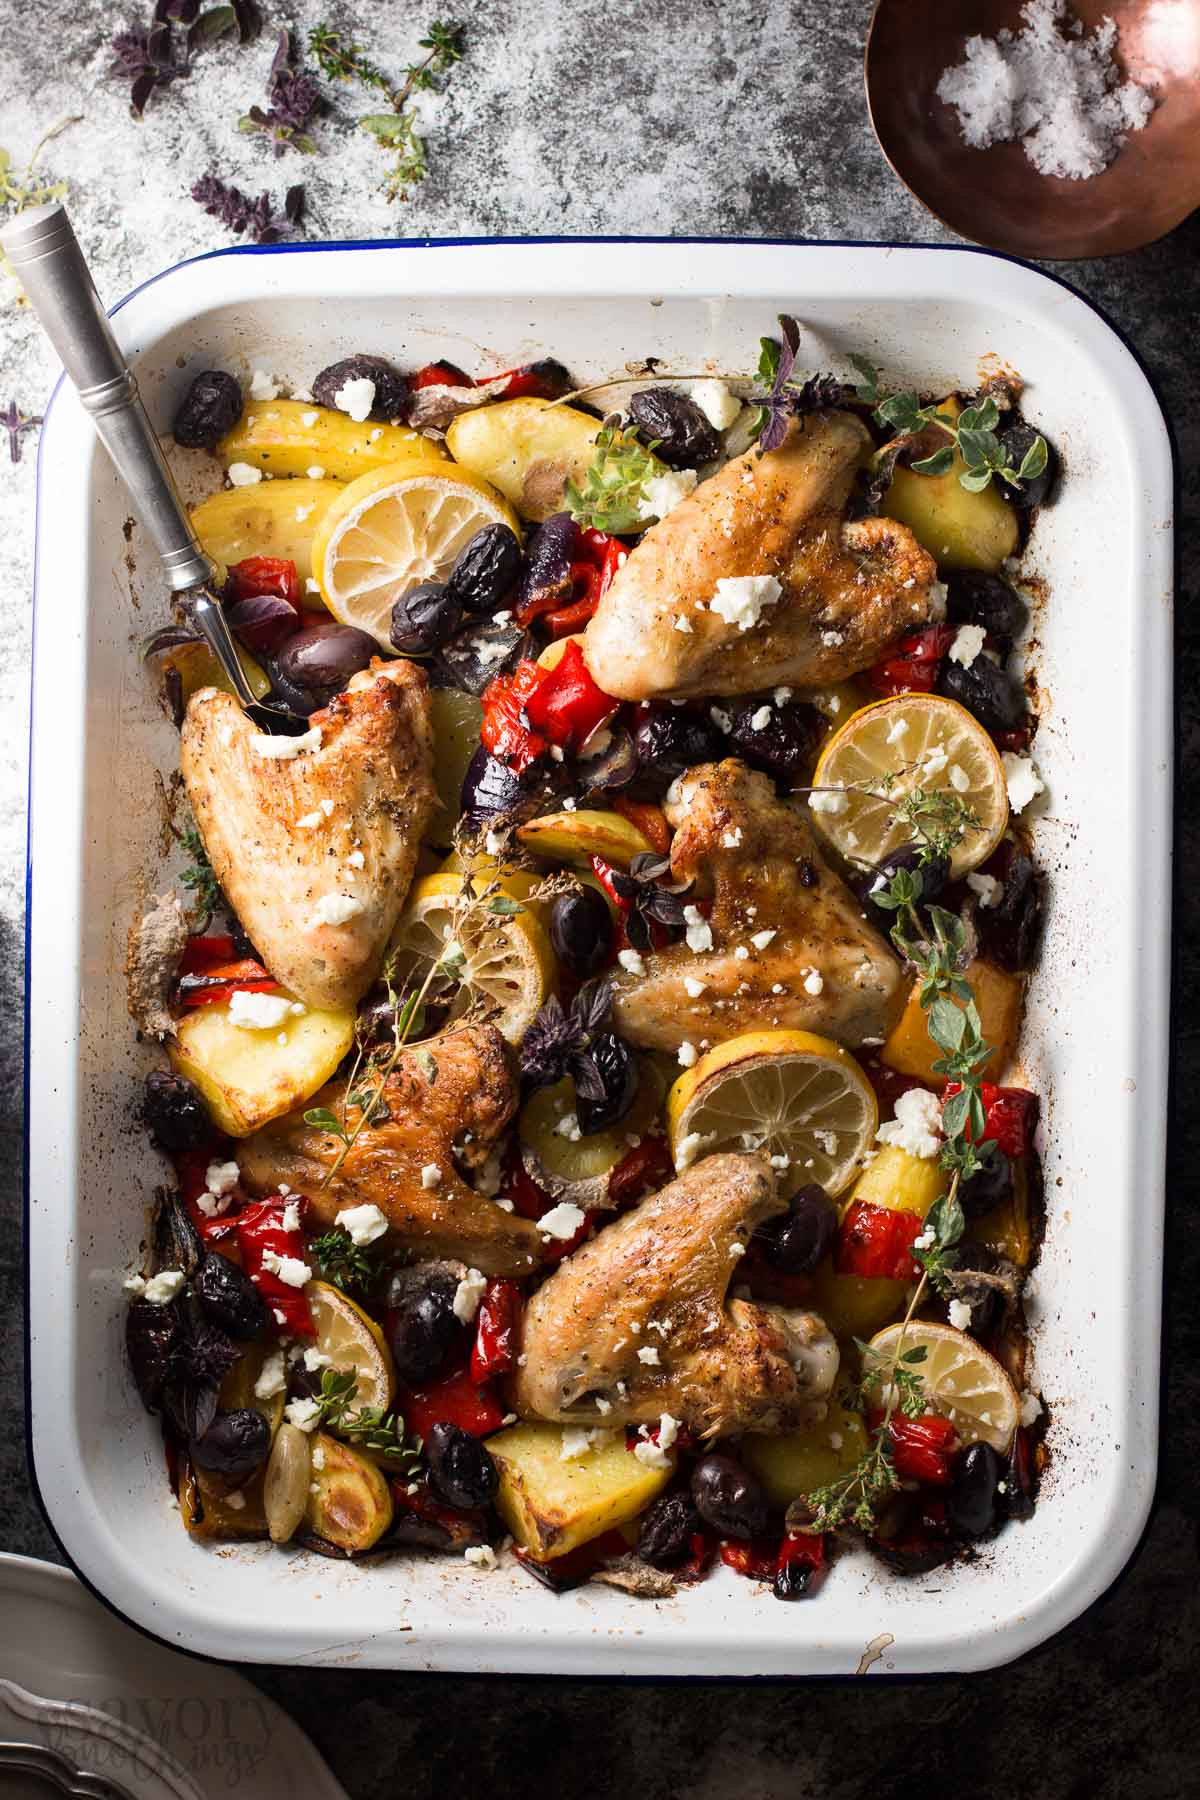 Baked Greek Chicken Recipe  Easy Baked Chicken Dinner Greek Lemon Chicken with Veggies